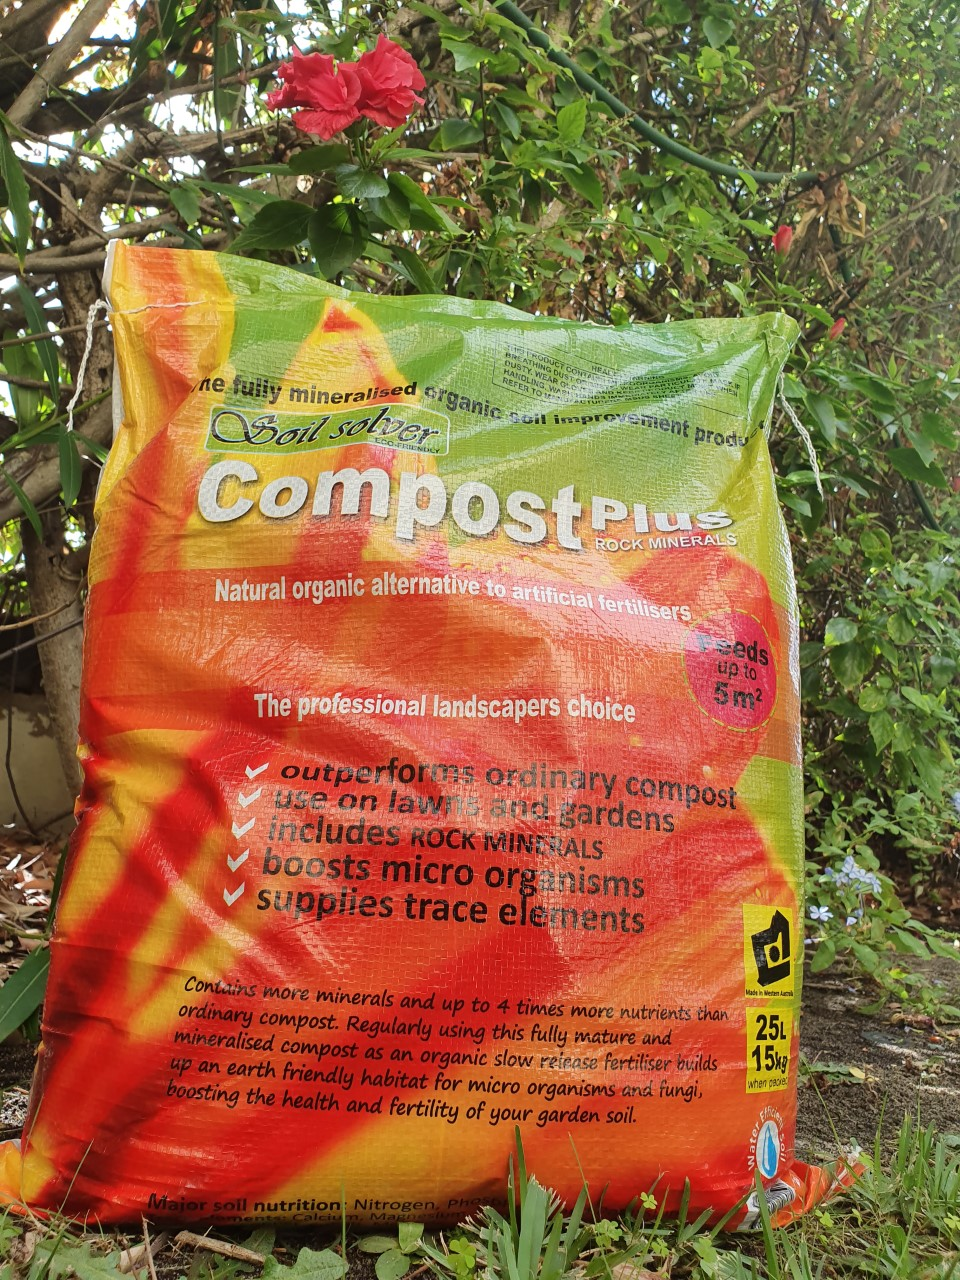 compost-plus2.jpg